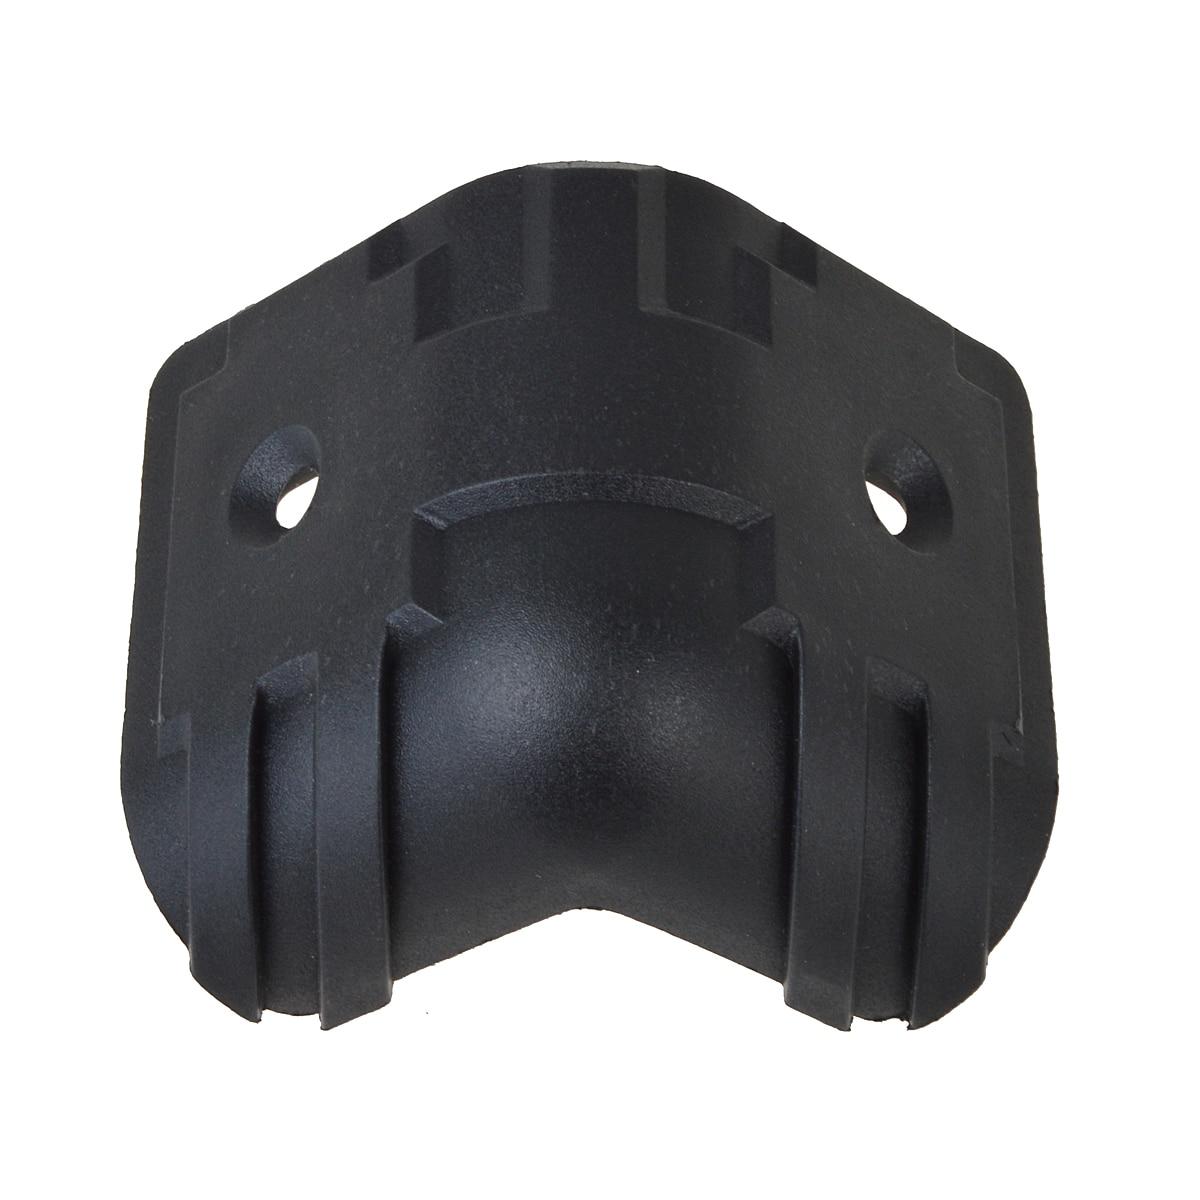 4Pcs Black Hard Plastic Guitar Amp Cabinets Amplifier Speaker Cabinet  Corner Protectors L In Guitar